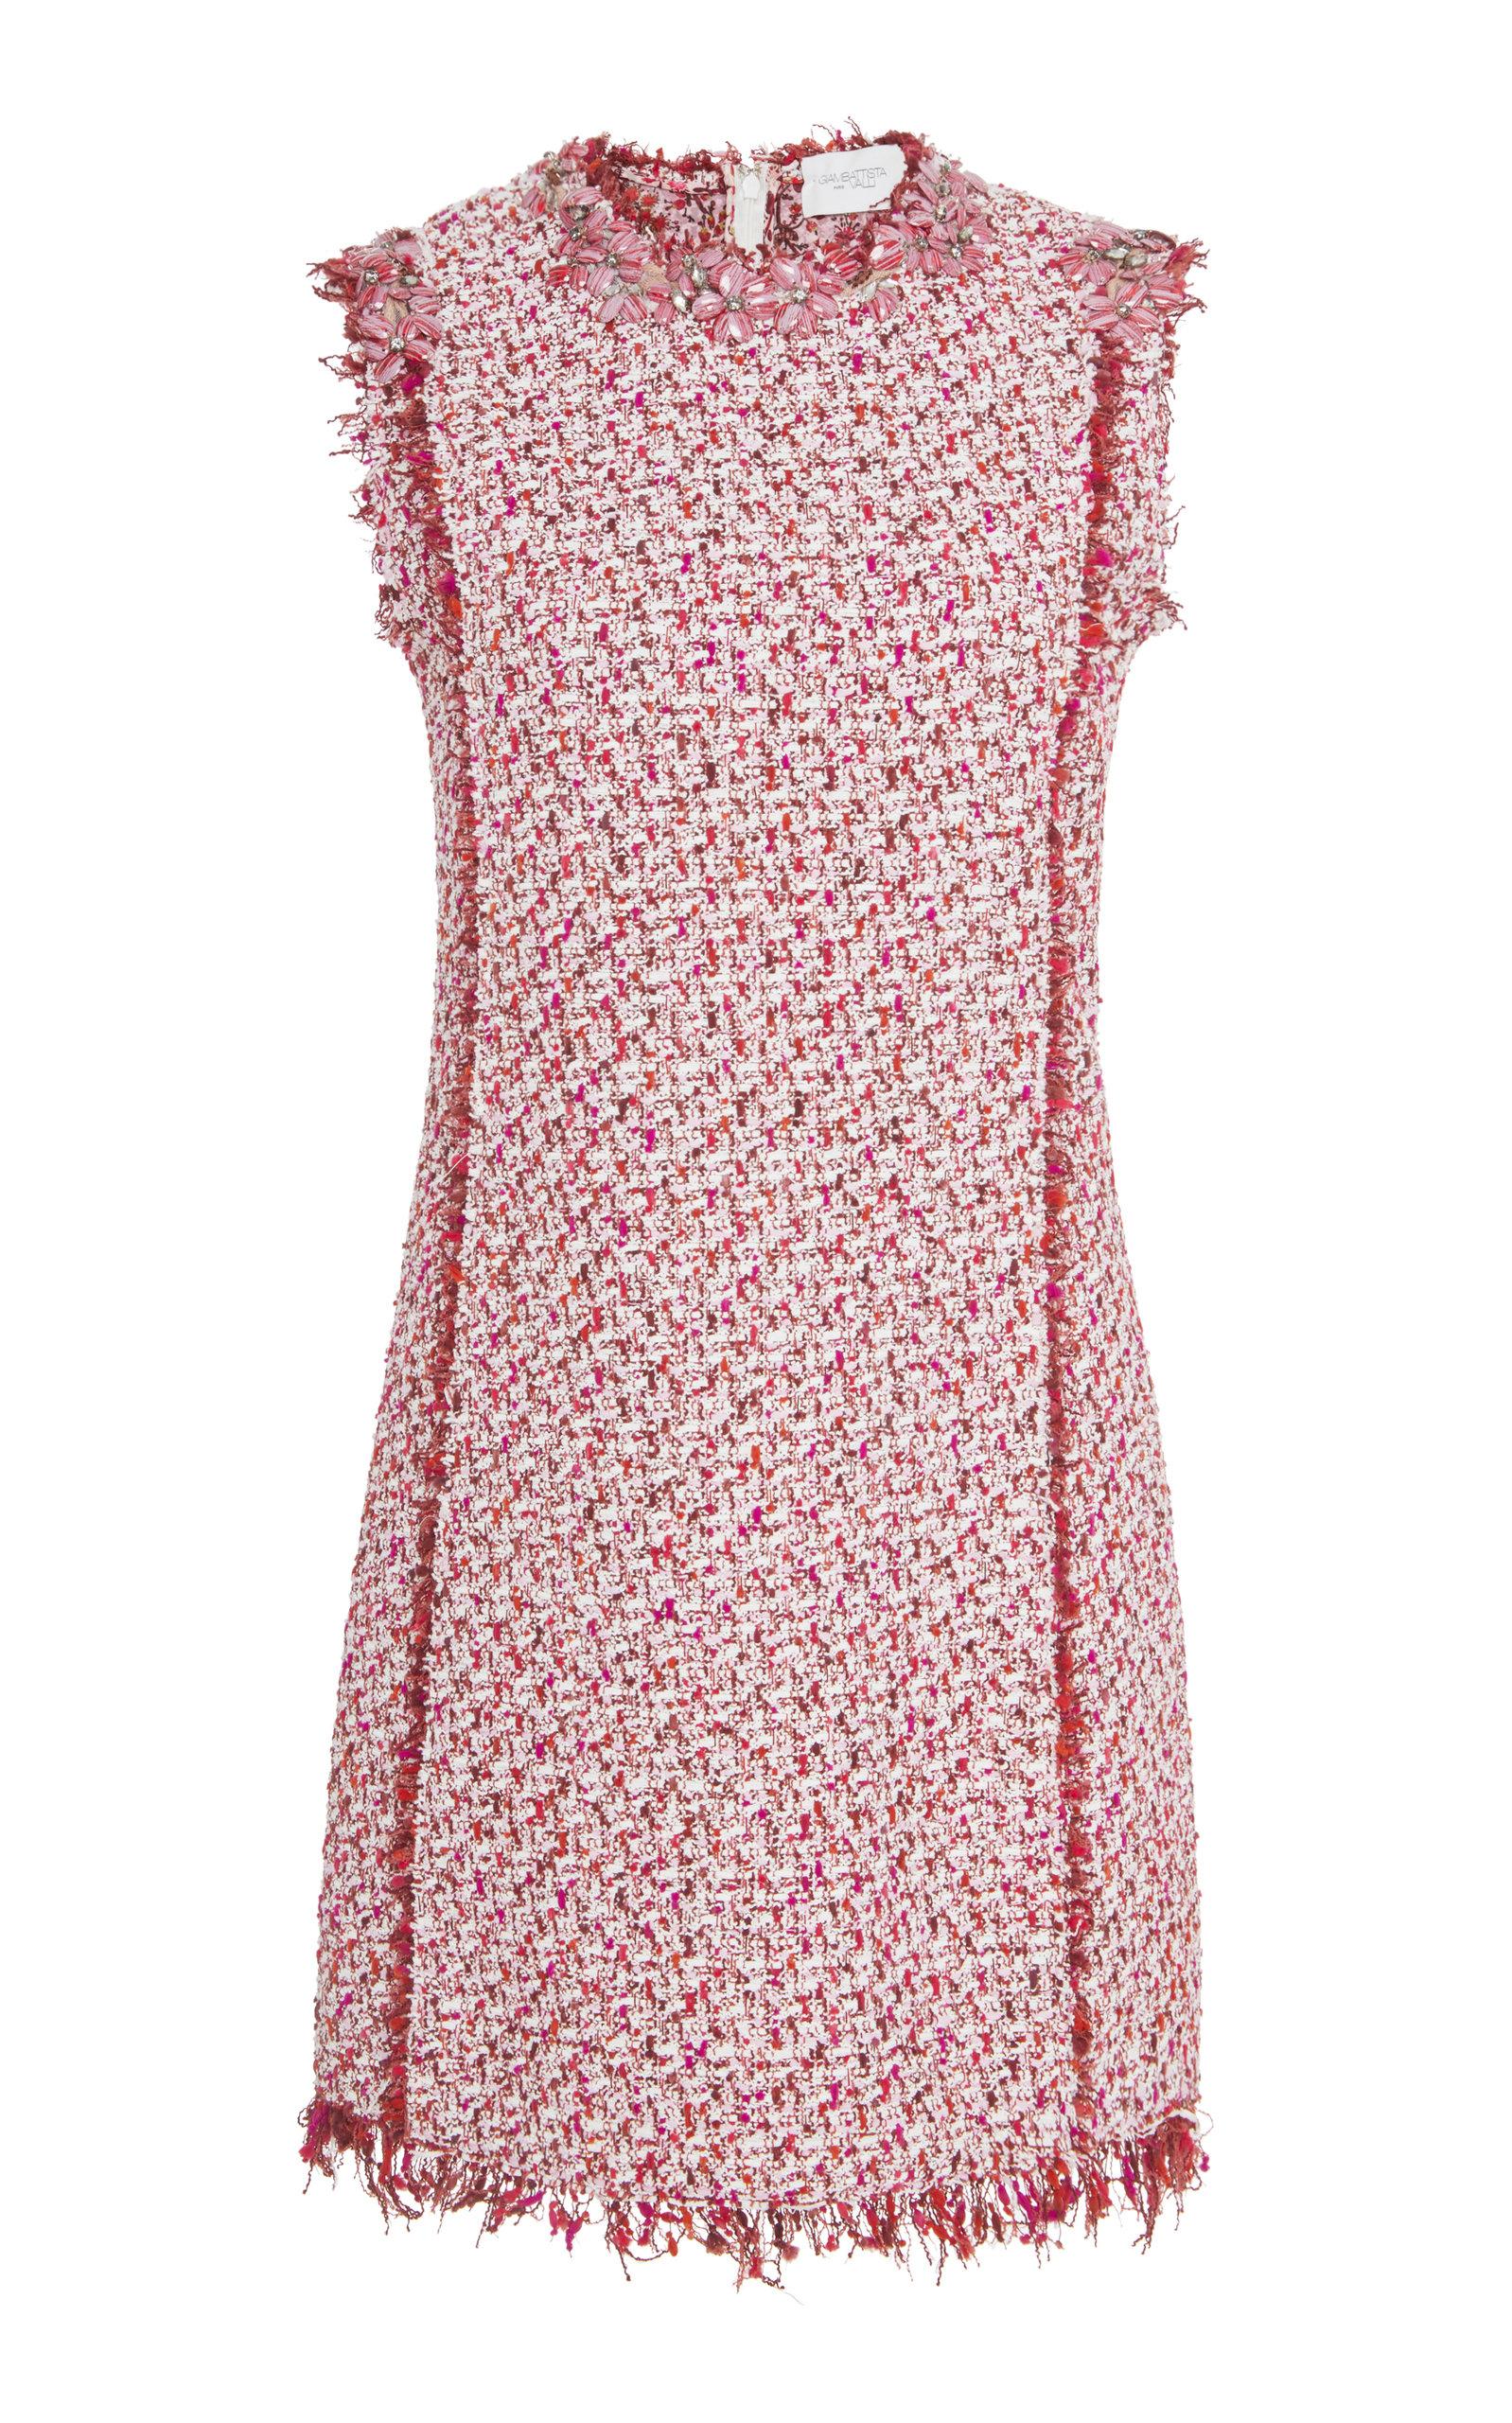 GIAMBATTISTA VALLI Sleeveless Fringe-Edge Tweed Shift Dress in Pink